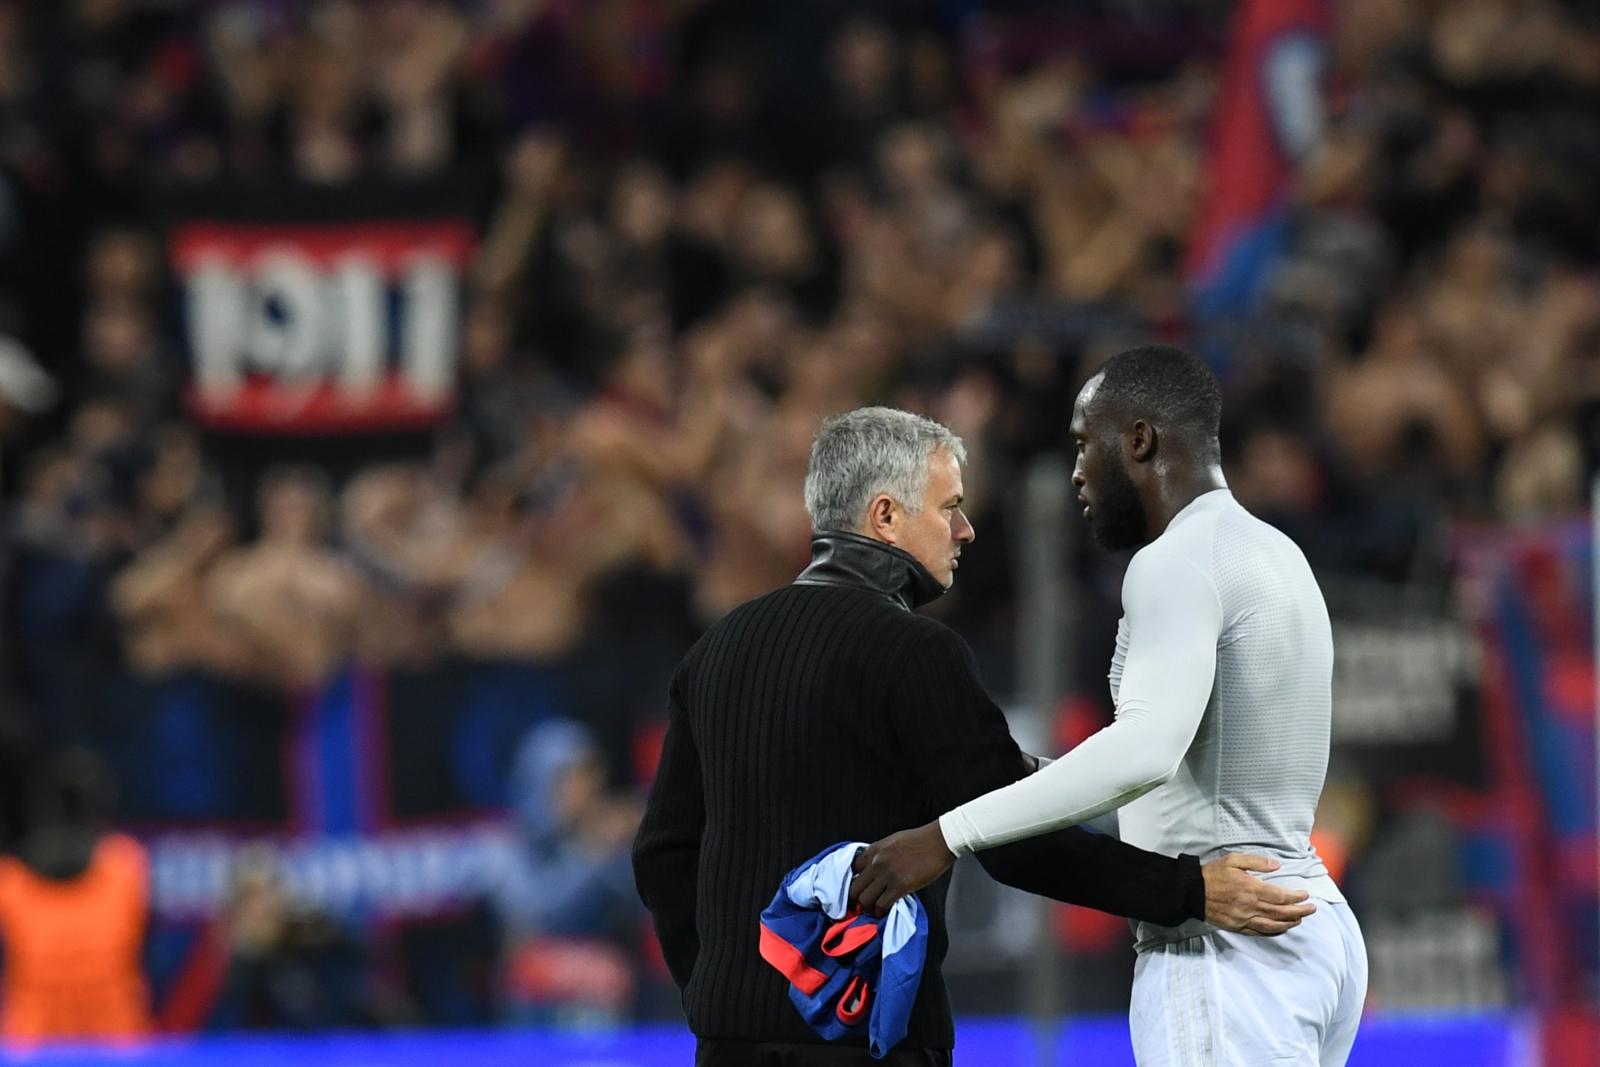 jose-mourinho-satisfied-after-lukaku-double-leads-man-united-to-4-1-win